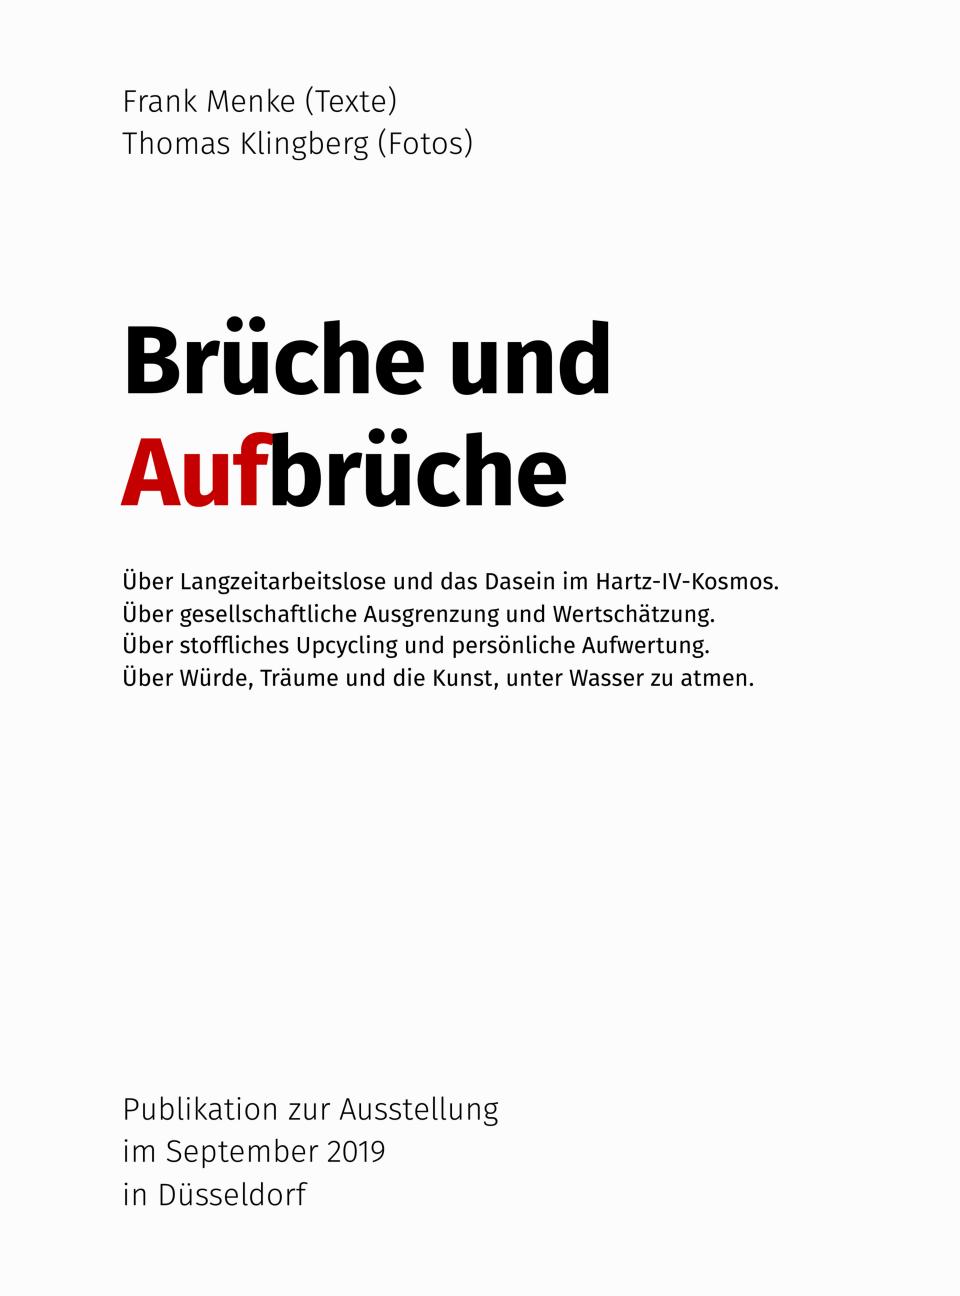 Publikation Ausstellung Brüche Aufbrüche Thomas Klingberg Frank Menke Kopie